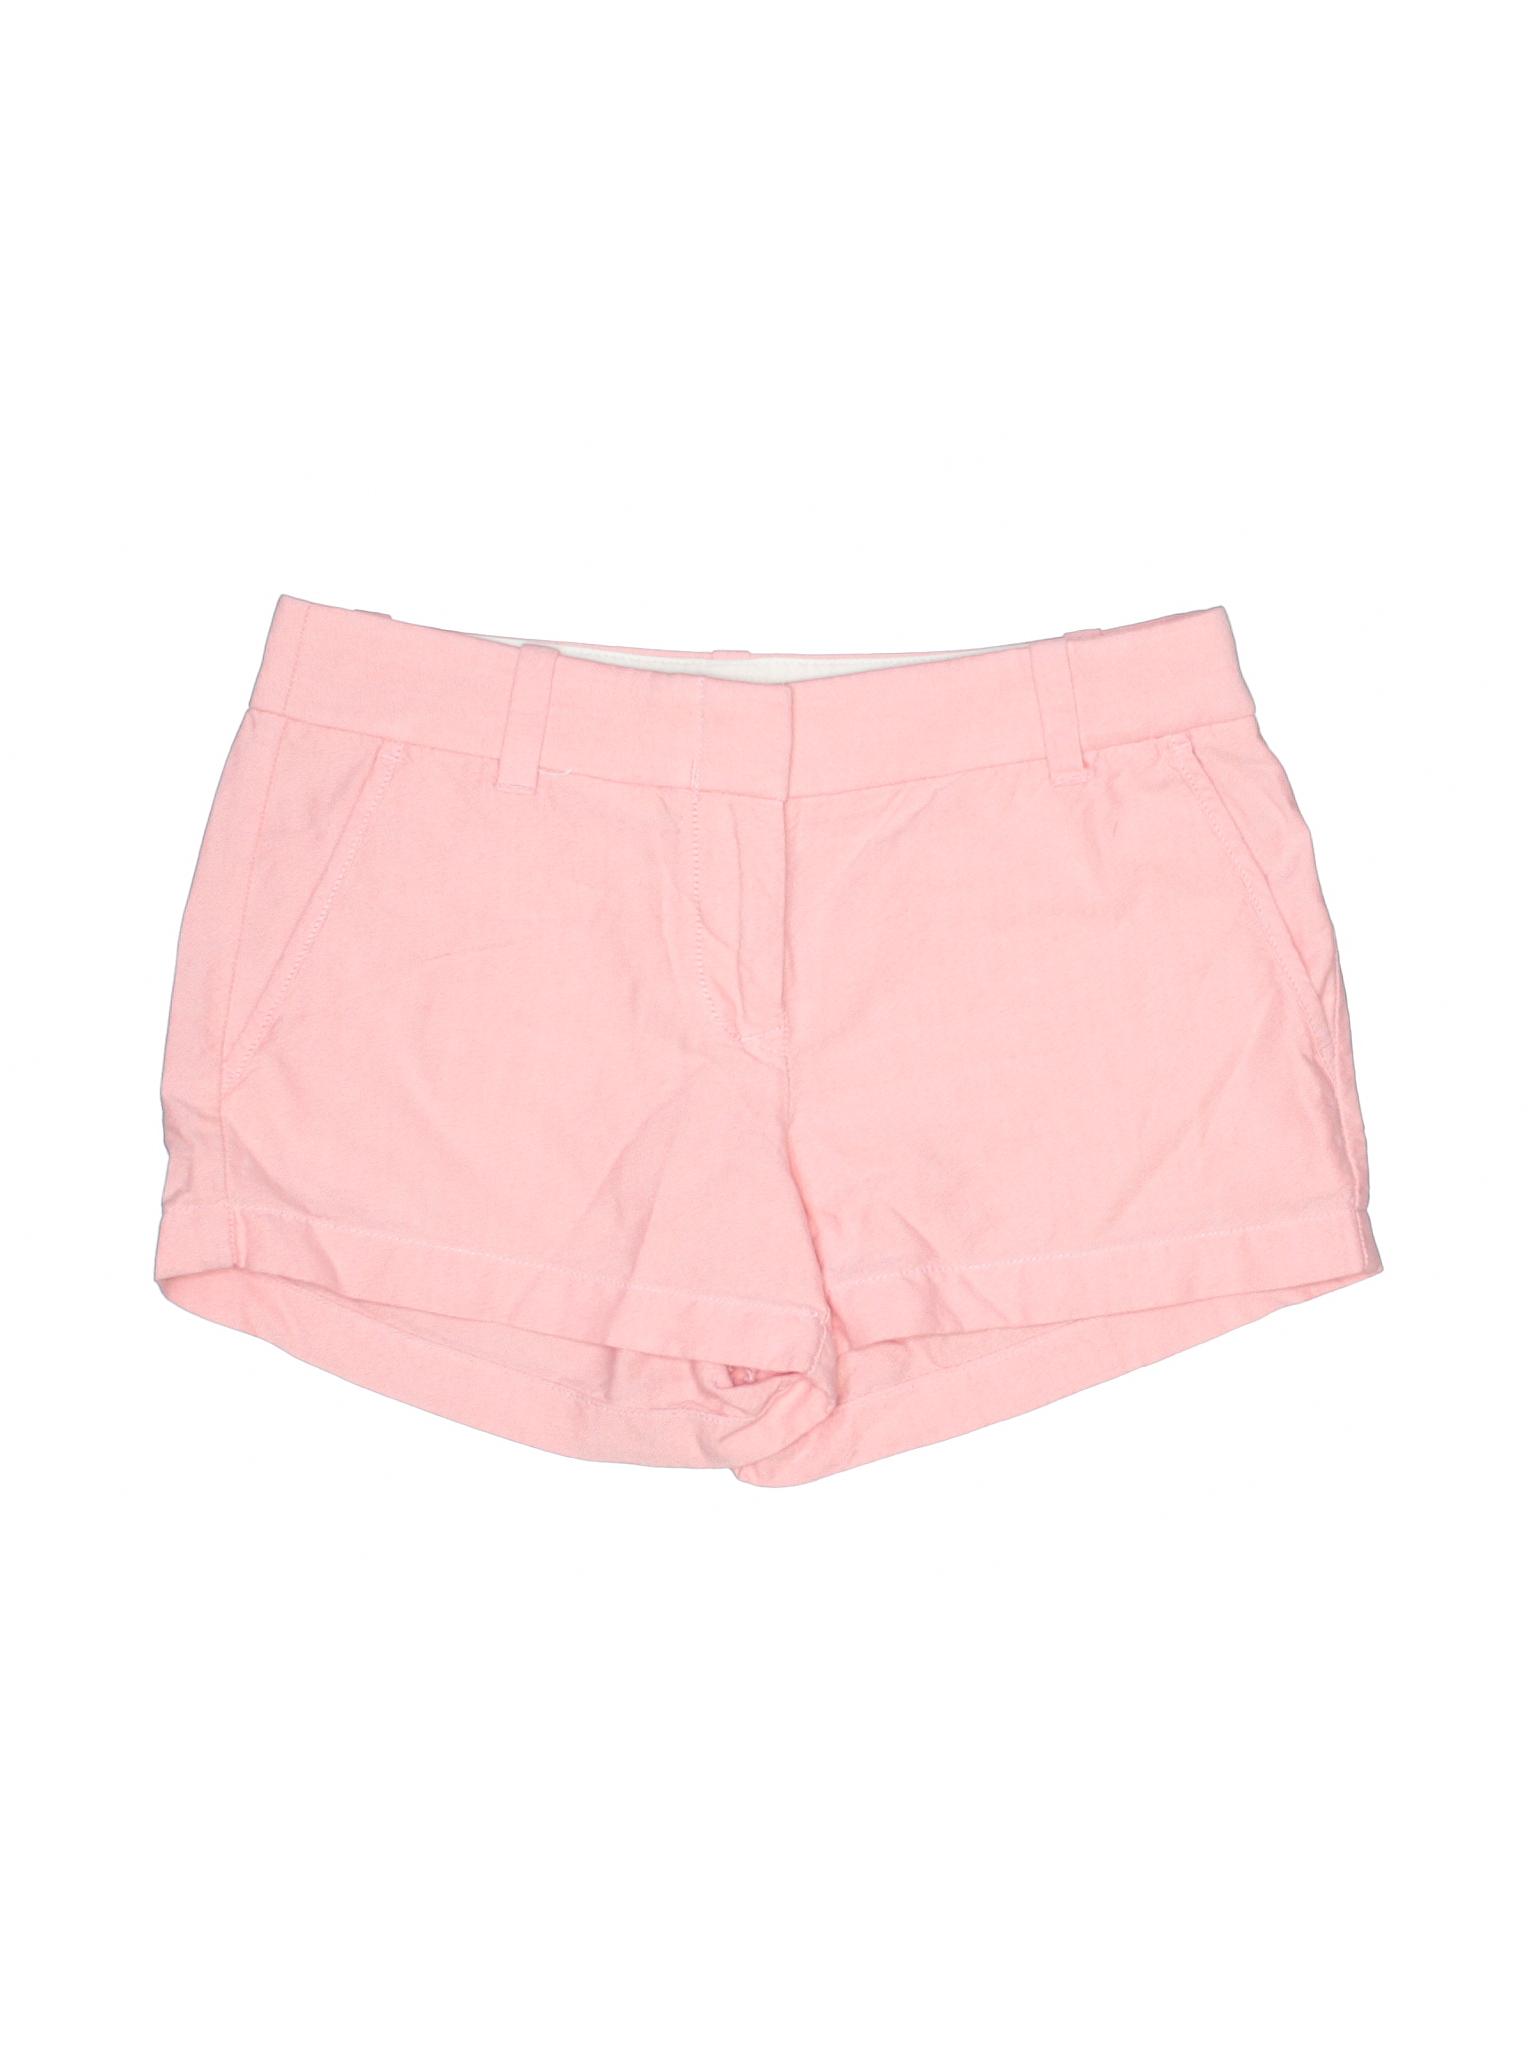 Khaki Boutique J Khaki Boutique Shorts Crew Shorts J Crew 7qwHfU7x5W